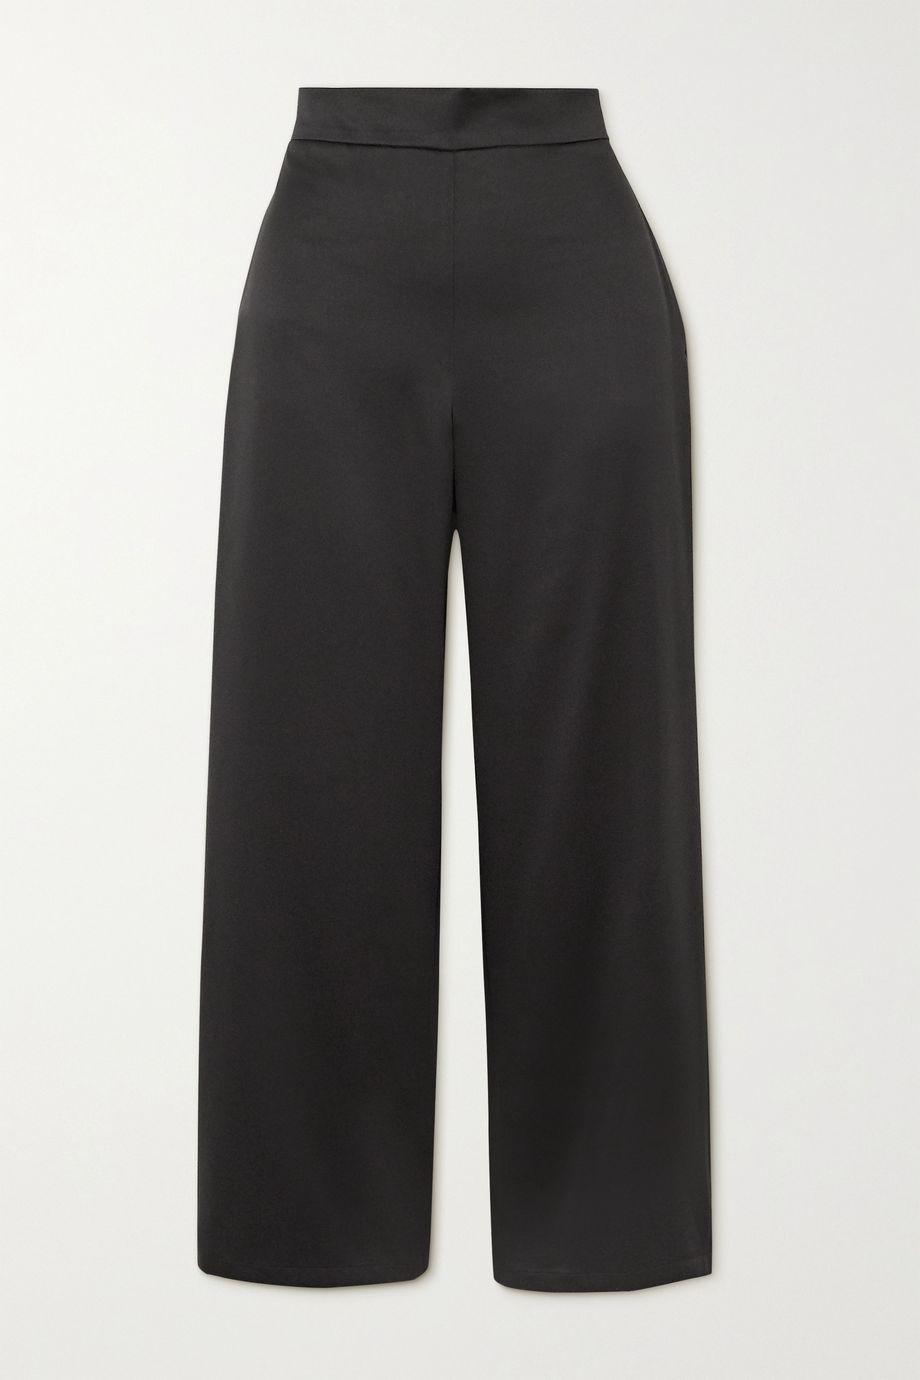 Max Mara Leisure washed-satin straight-leg pants